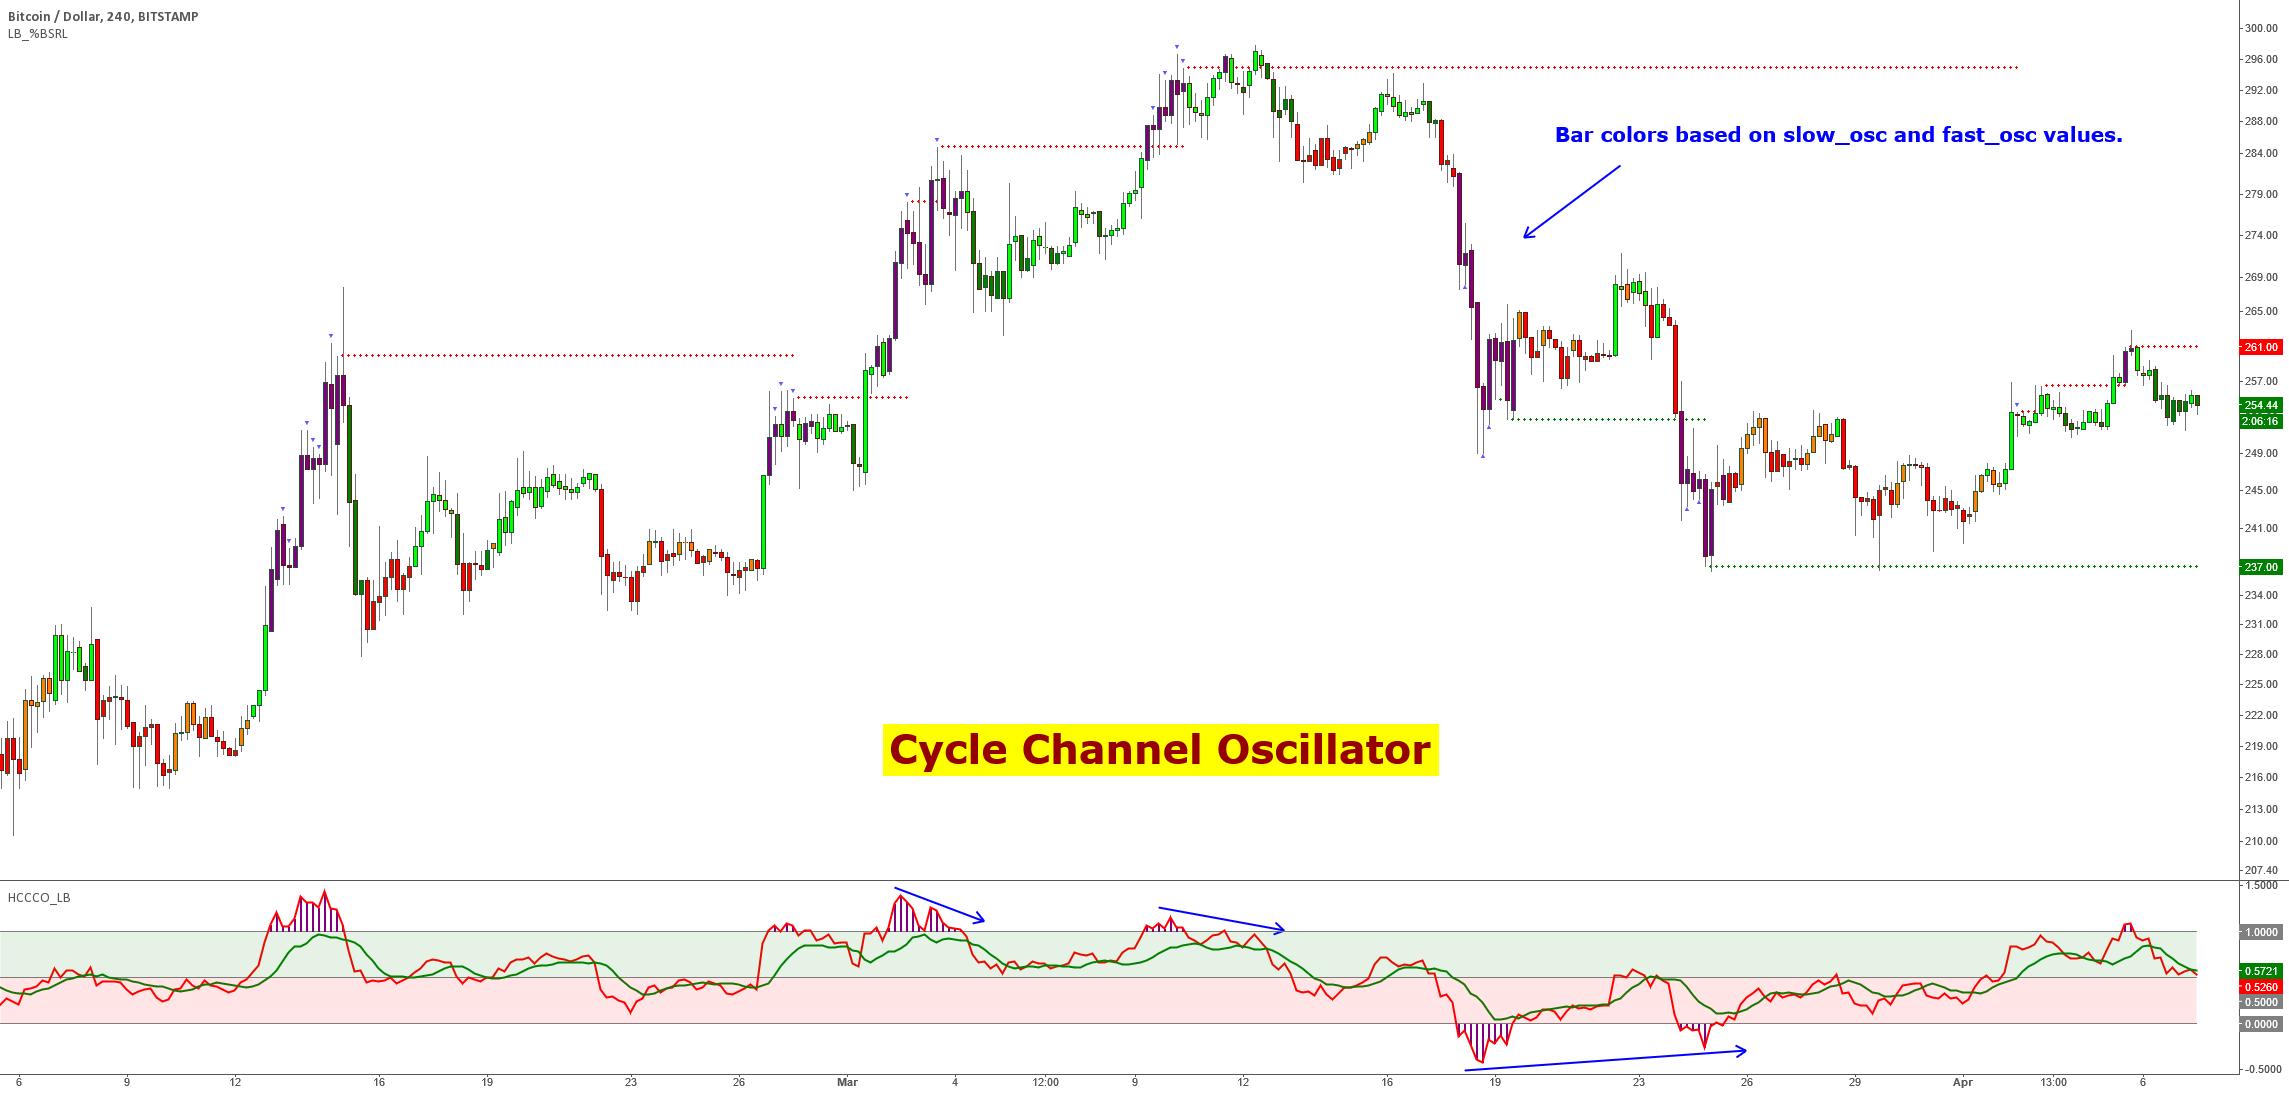 Cycle Channel Oscillator [LazyBear] — Indicator by LazyBear